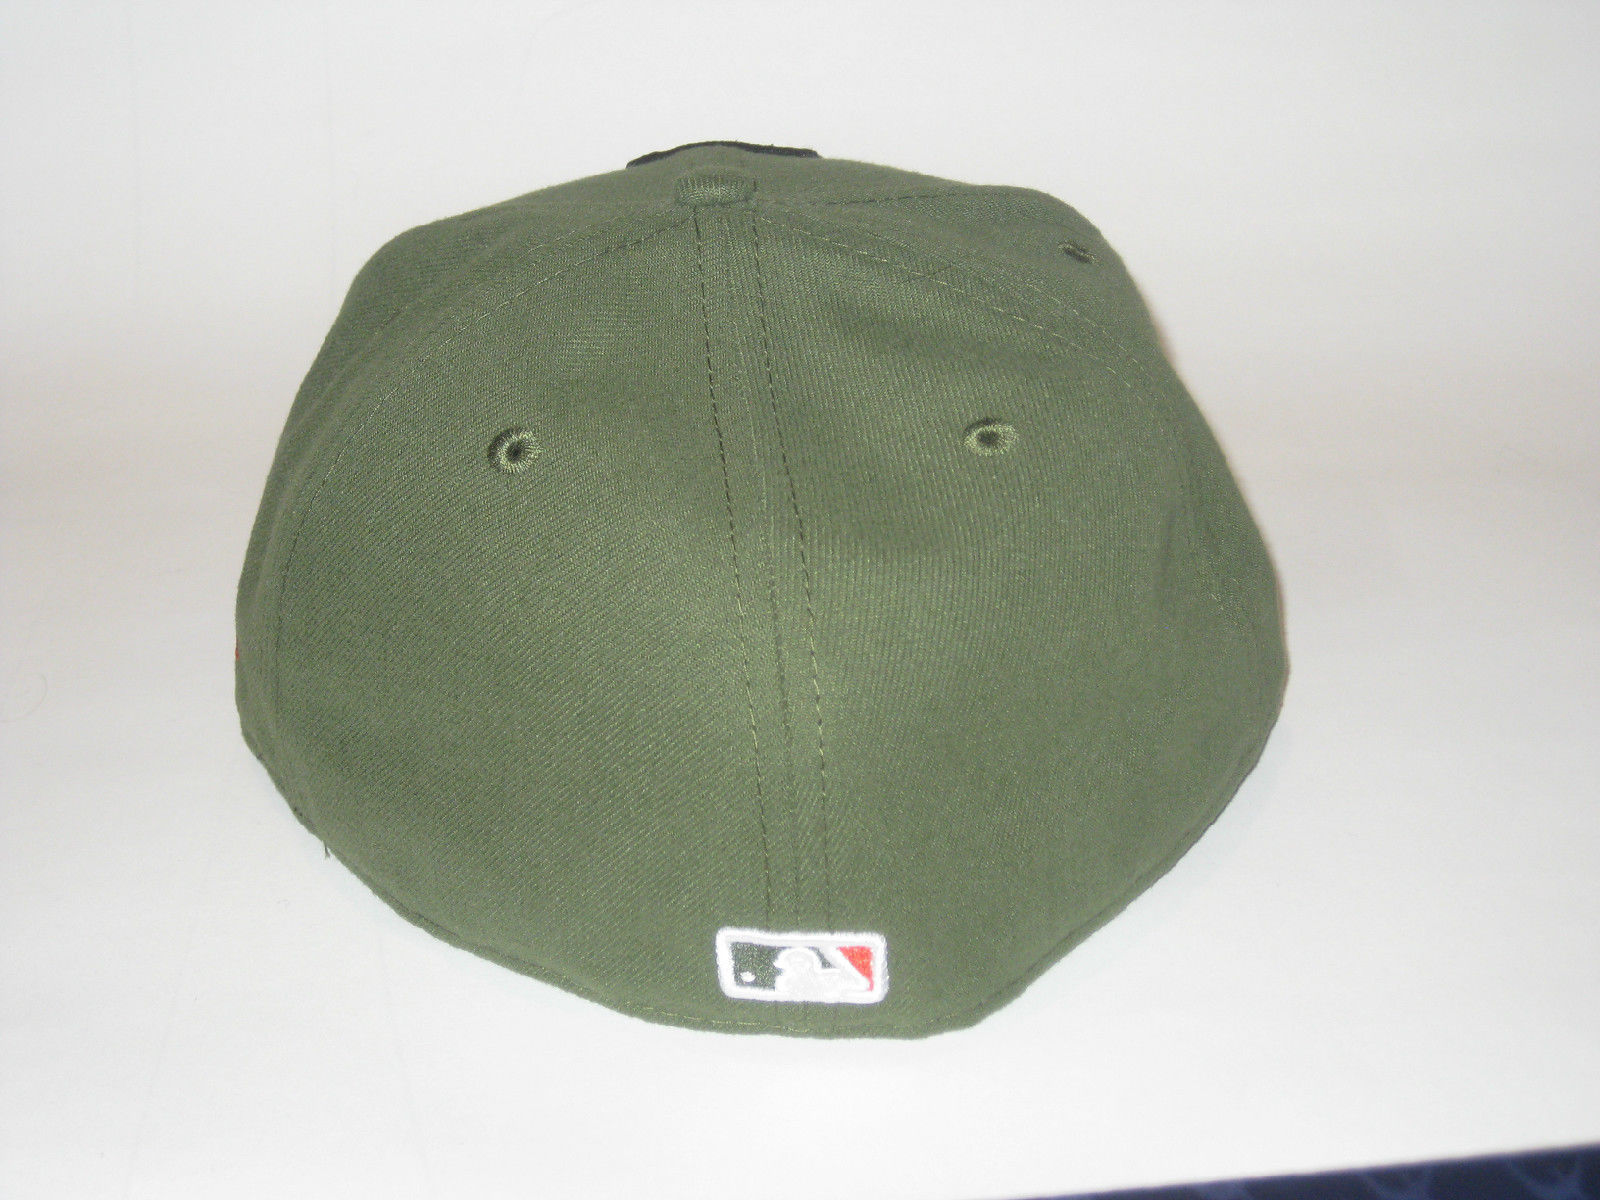 NEW ERA CALIFORNIA ANGELS LA RIFLE GREEN FITTED HAT CAP 7 1/4 59FIFTY BASEBALL